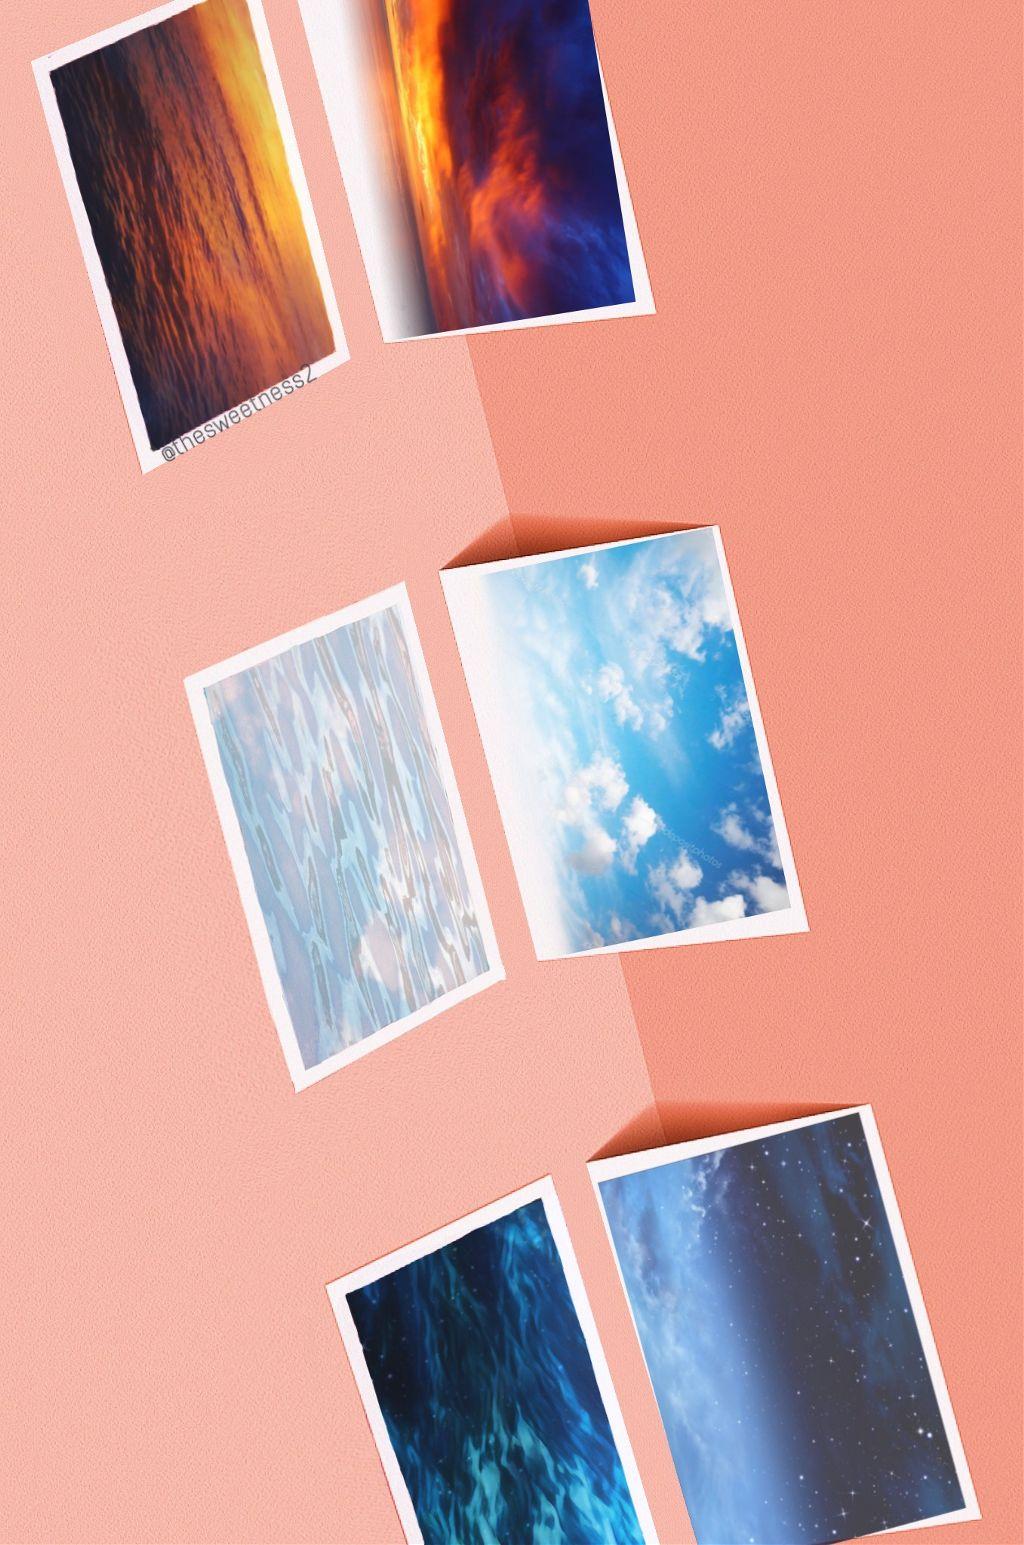 #freetoedit #postcards #sunset #sunrise #midnight #night #nightsky #morningsky #Sun #water #DarkWater #beautiful #mail #letters #peace #peach #dark